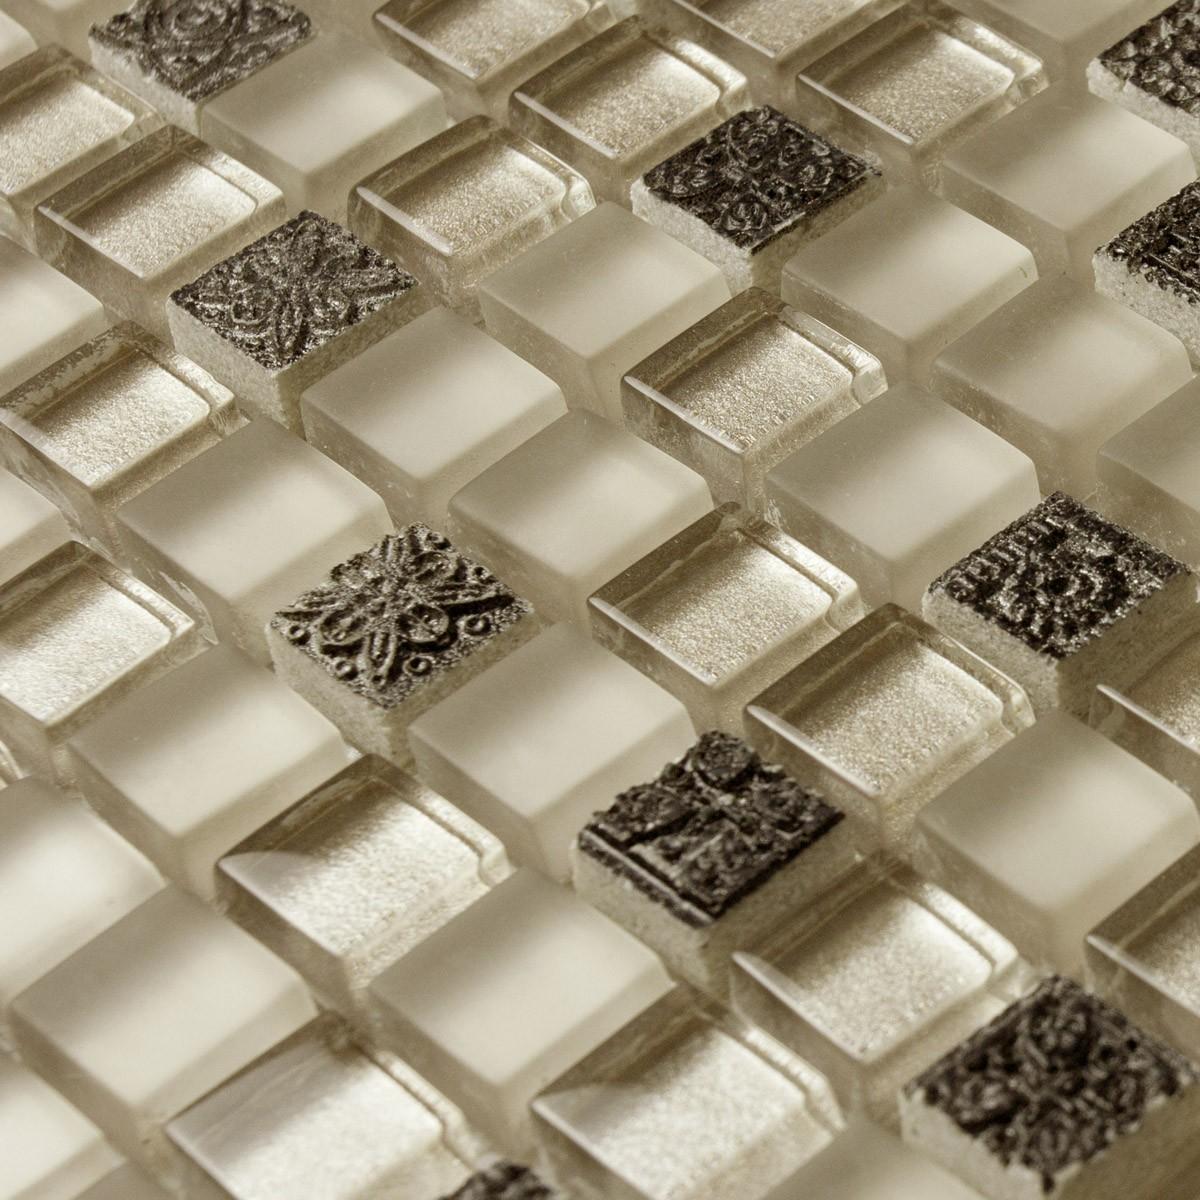 Rustic flower brief beijingqiang mosaic home improvement(China (Mainland))